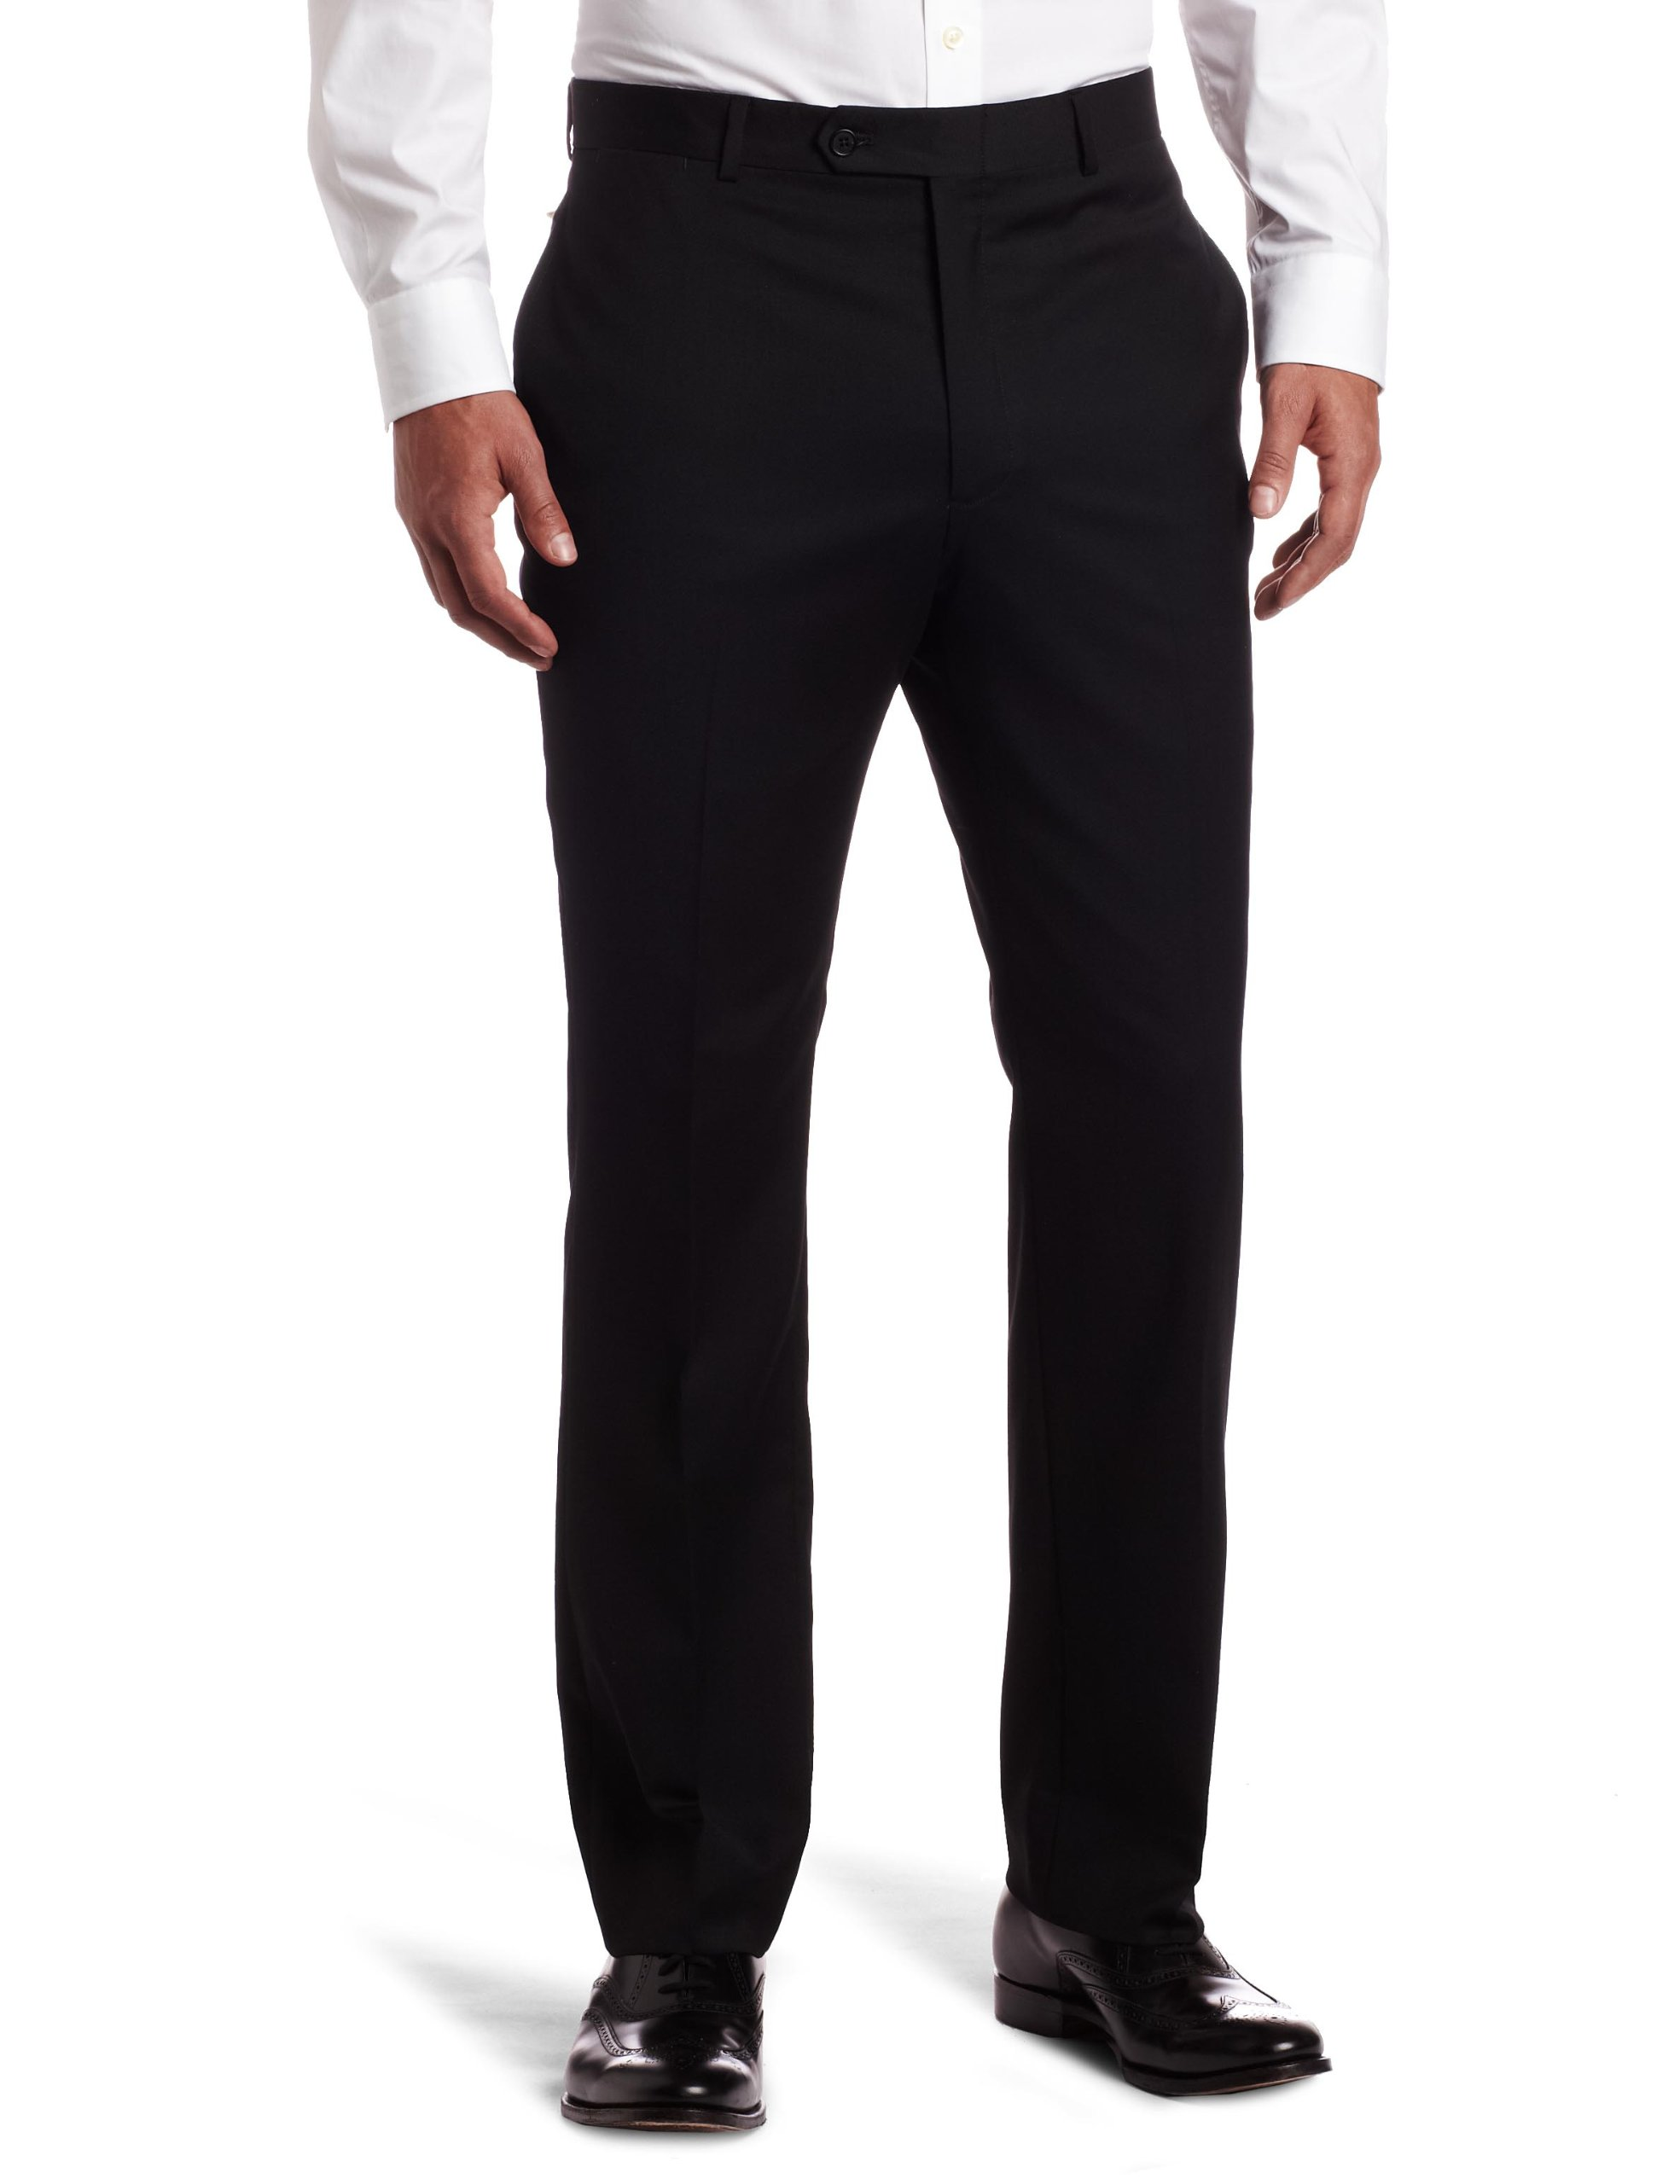 Tommy Hilfiger Mens Flat Front Trim Fit 100% Wool Suit Separate Pant, Black Solid, 32W x 30L by Tommy Hilfiger